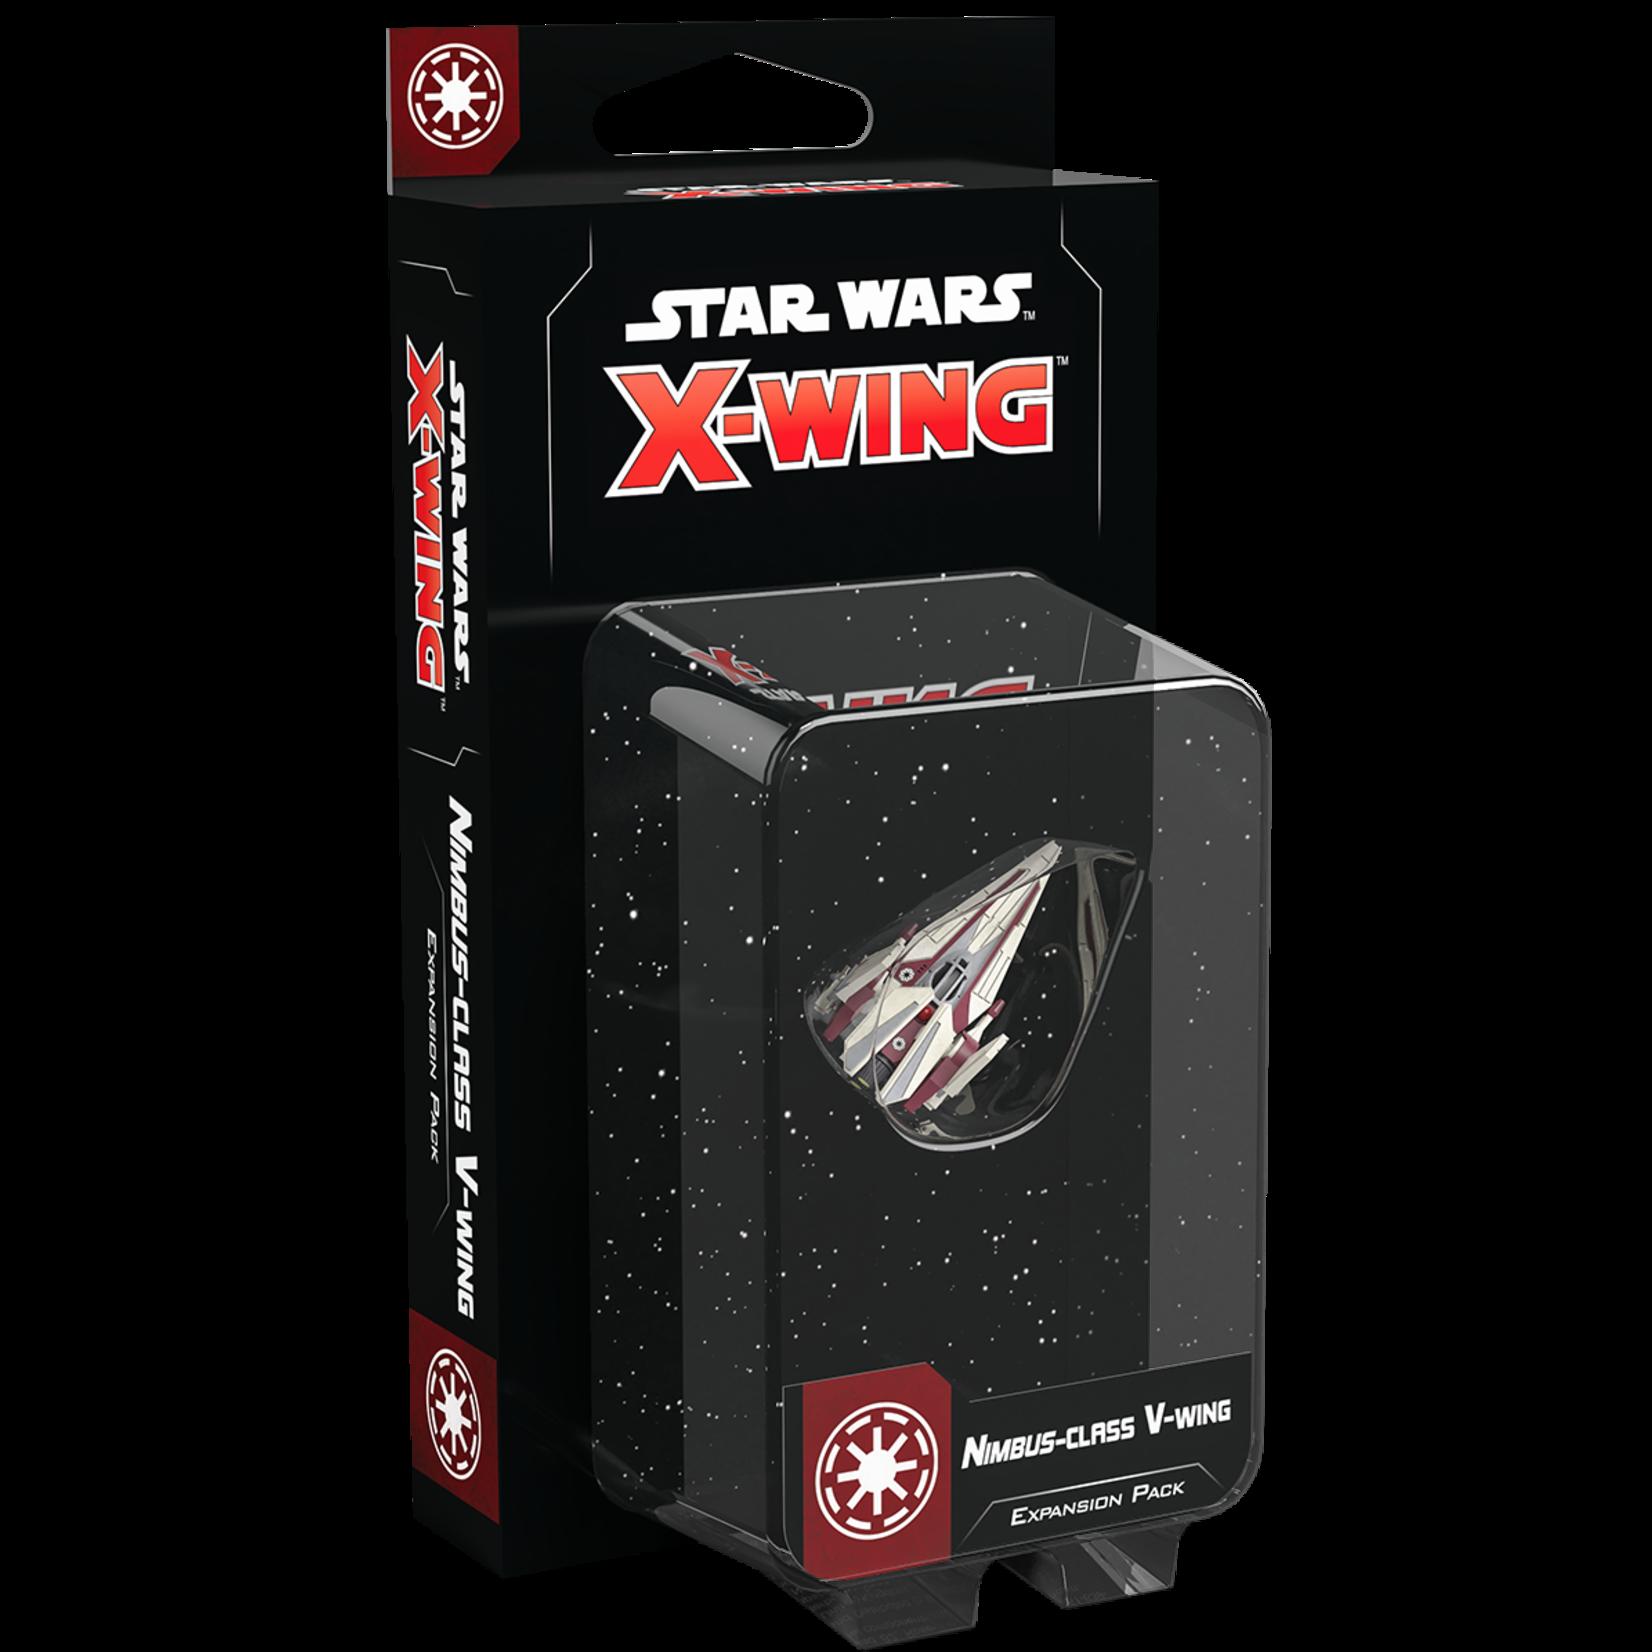 Fantasy Flight Games Star Wars X-Wing: 2nd Edition - Nimbus-Class V-Wing Expansion